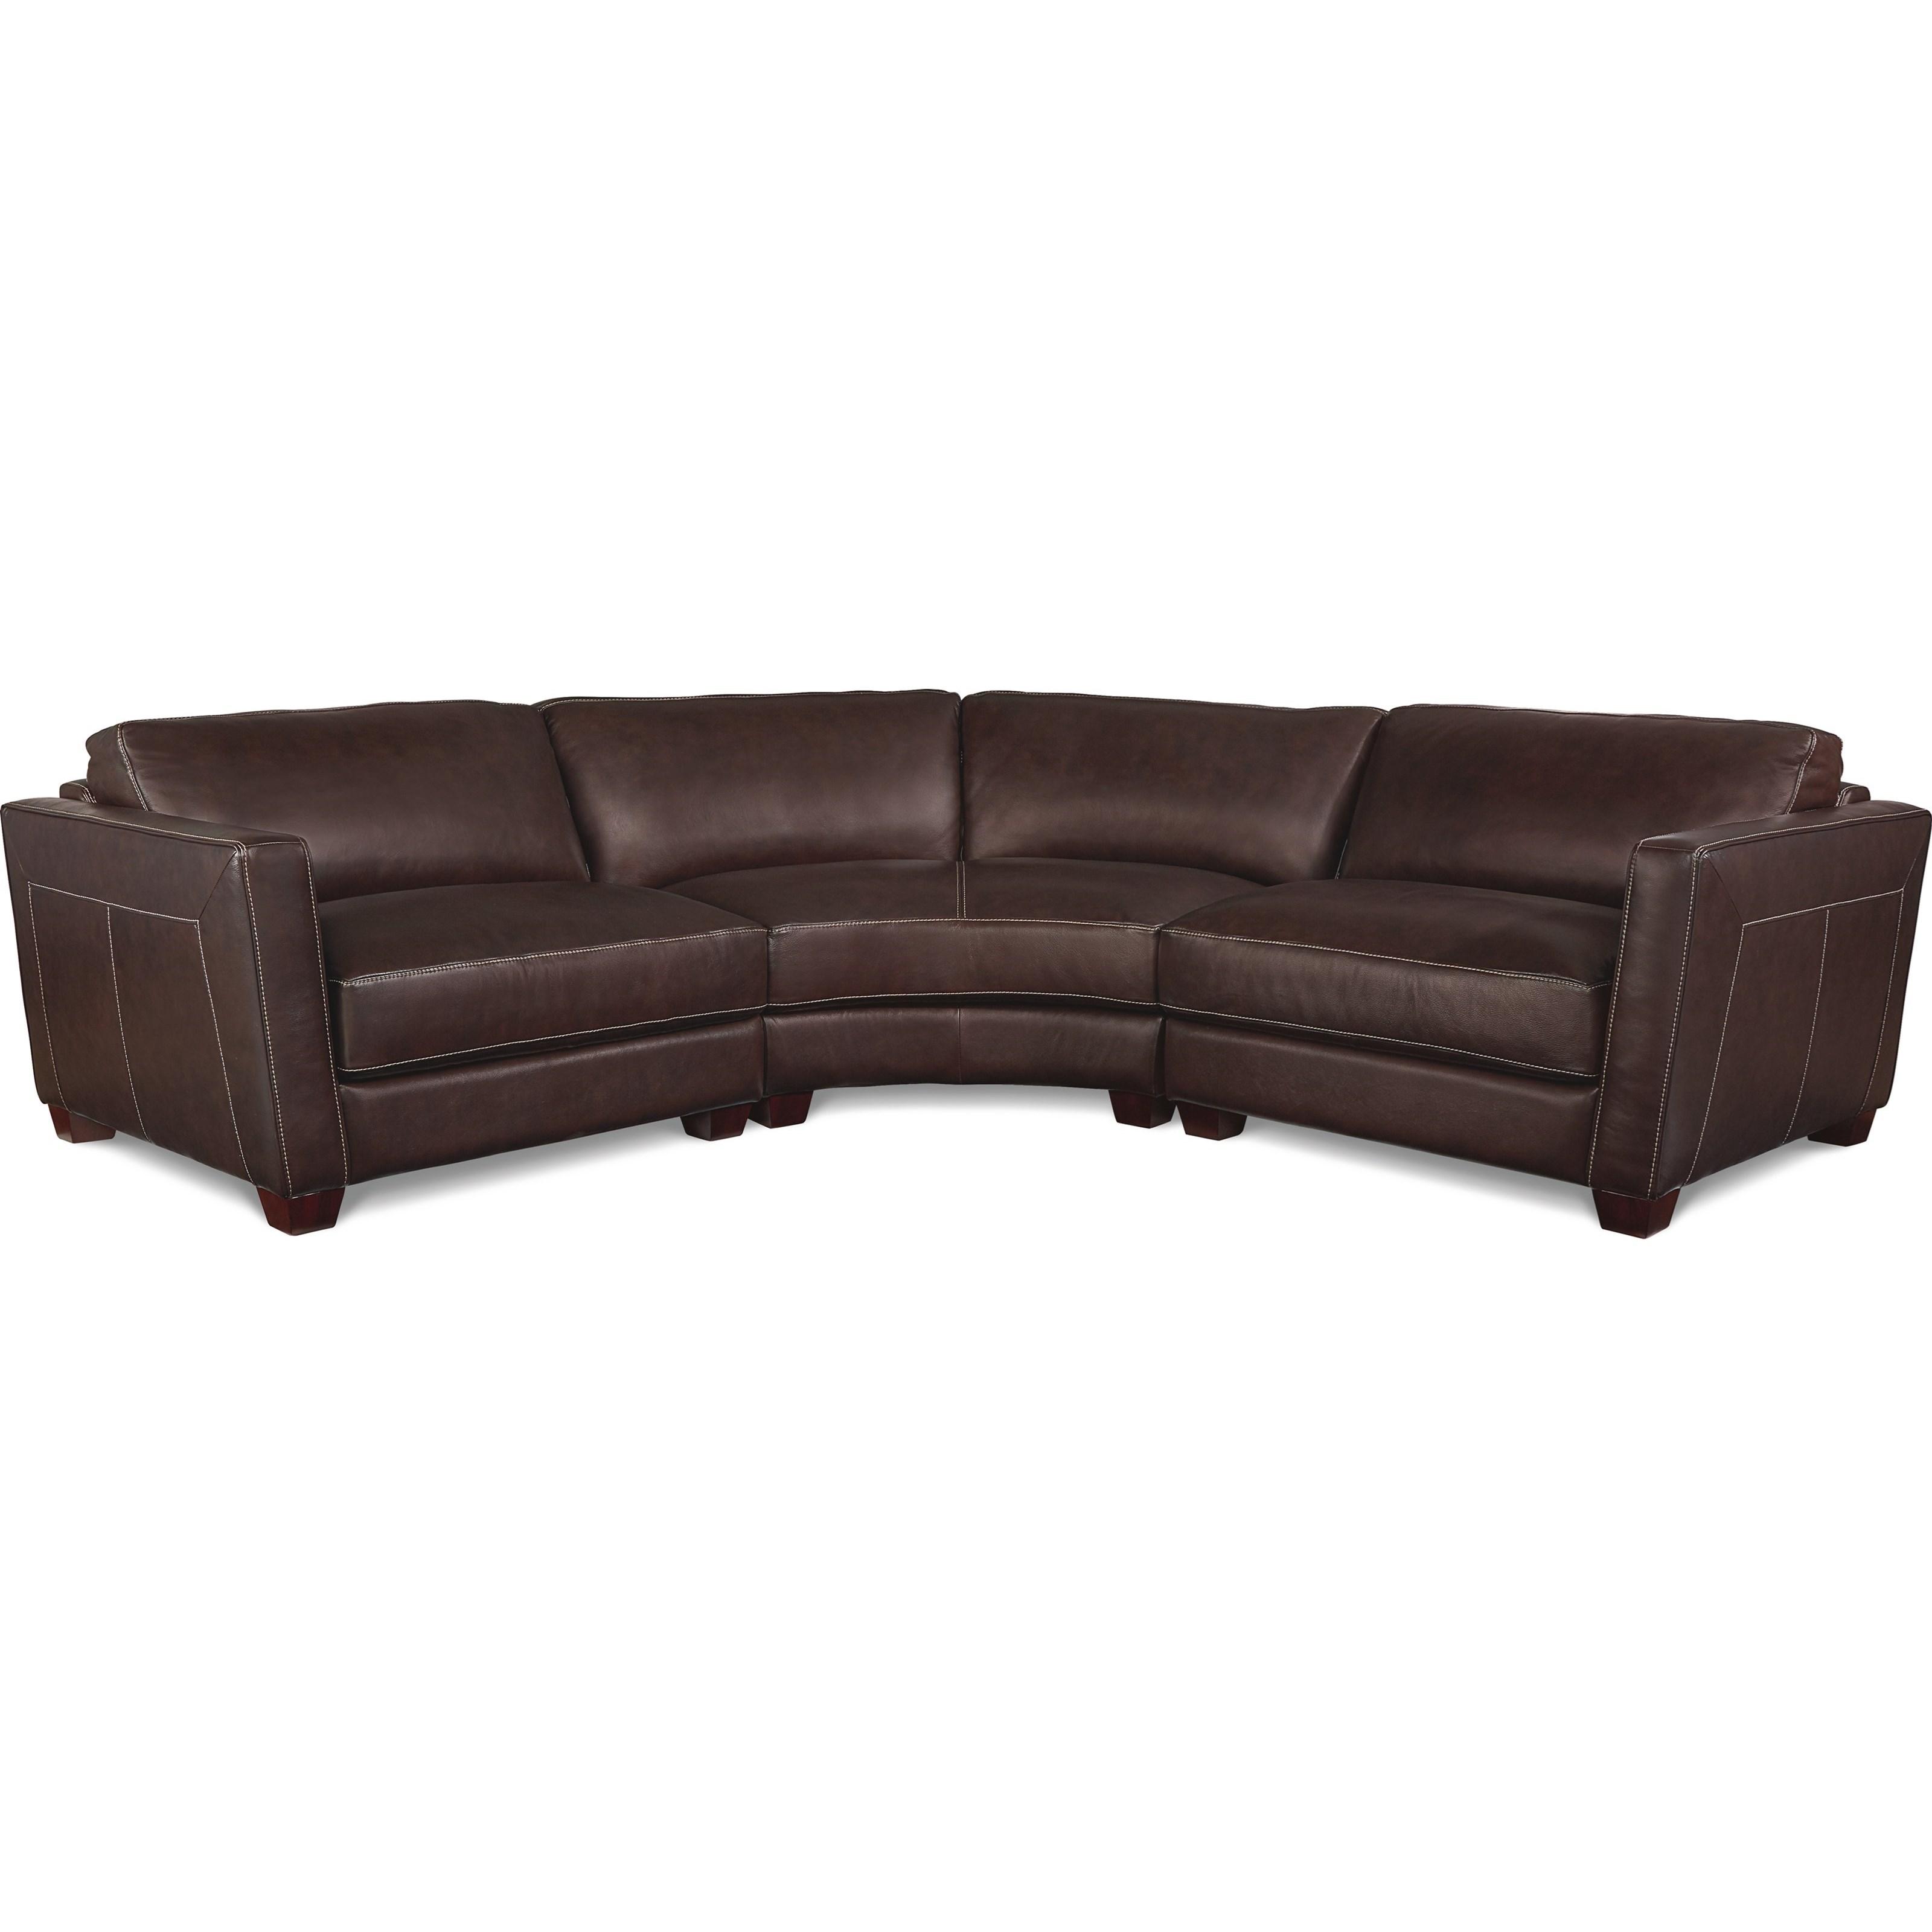 3 sided sectional sofa ofertas cama corte ingles three piece curved leather by la z boy